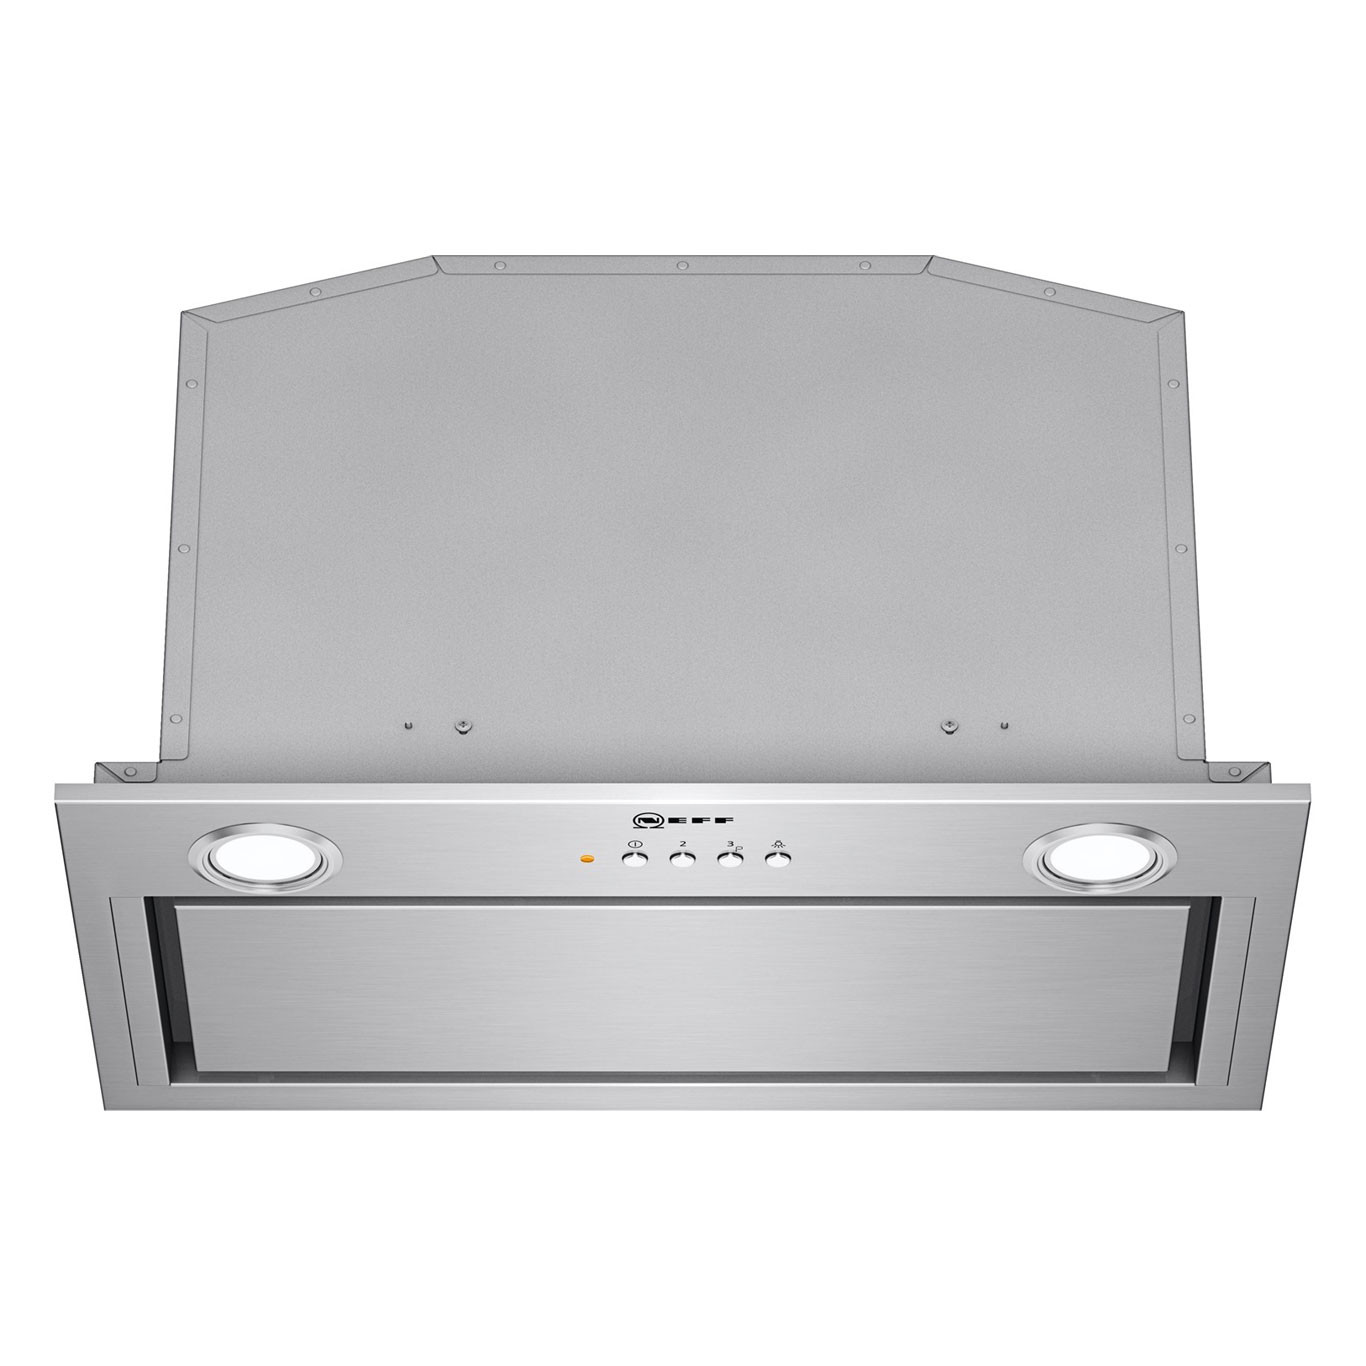 Neff N50 52cm Stainless Steel Canopy Hood D55MH56N0B